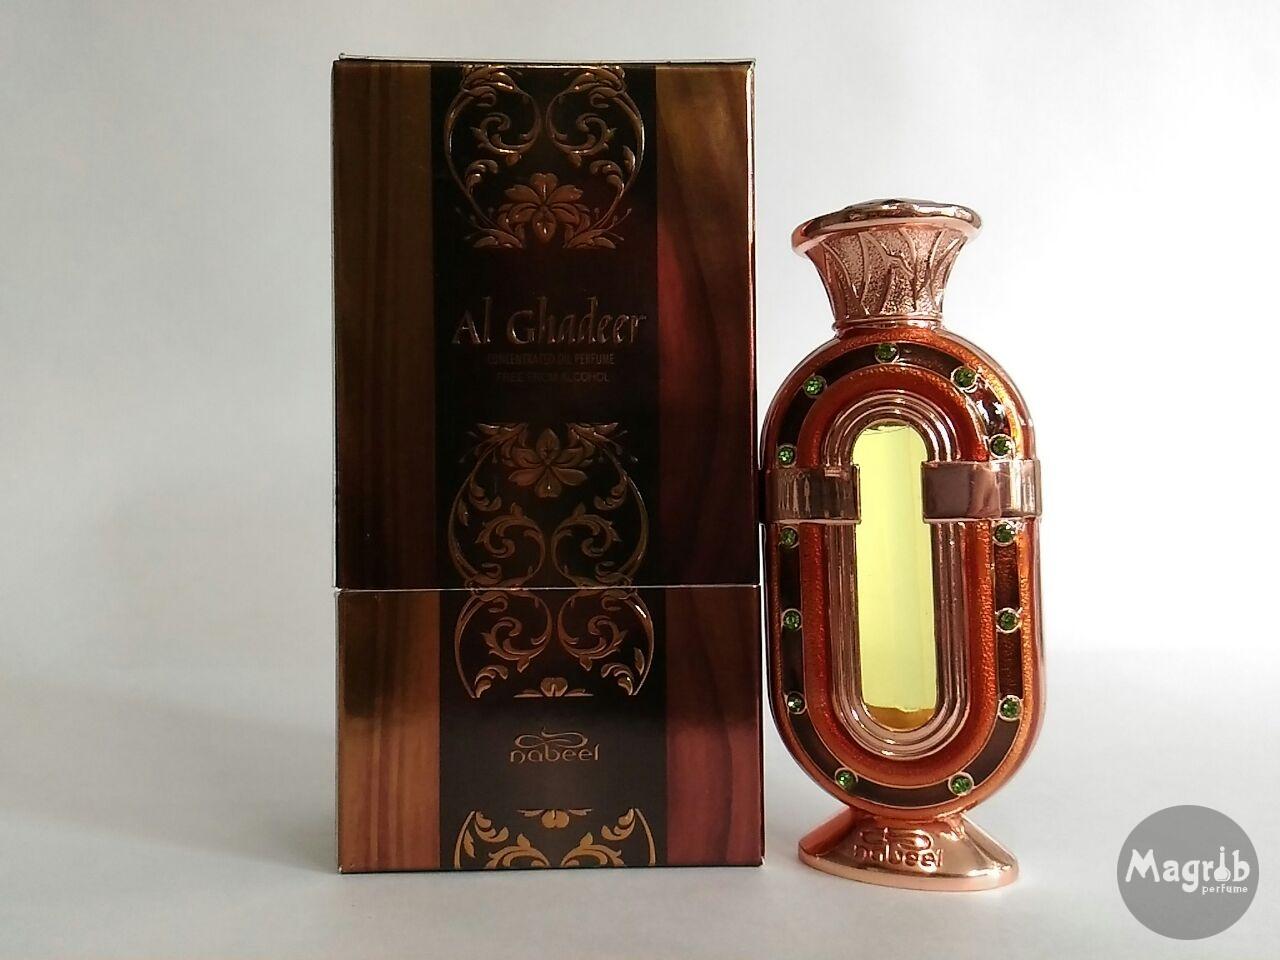 Nabeel Al Ghadeer 20ml - унисекс, масляные духи